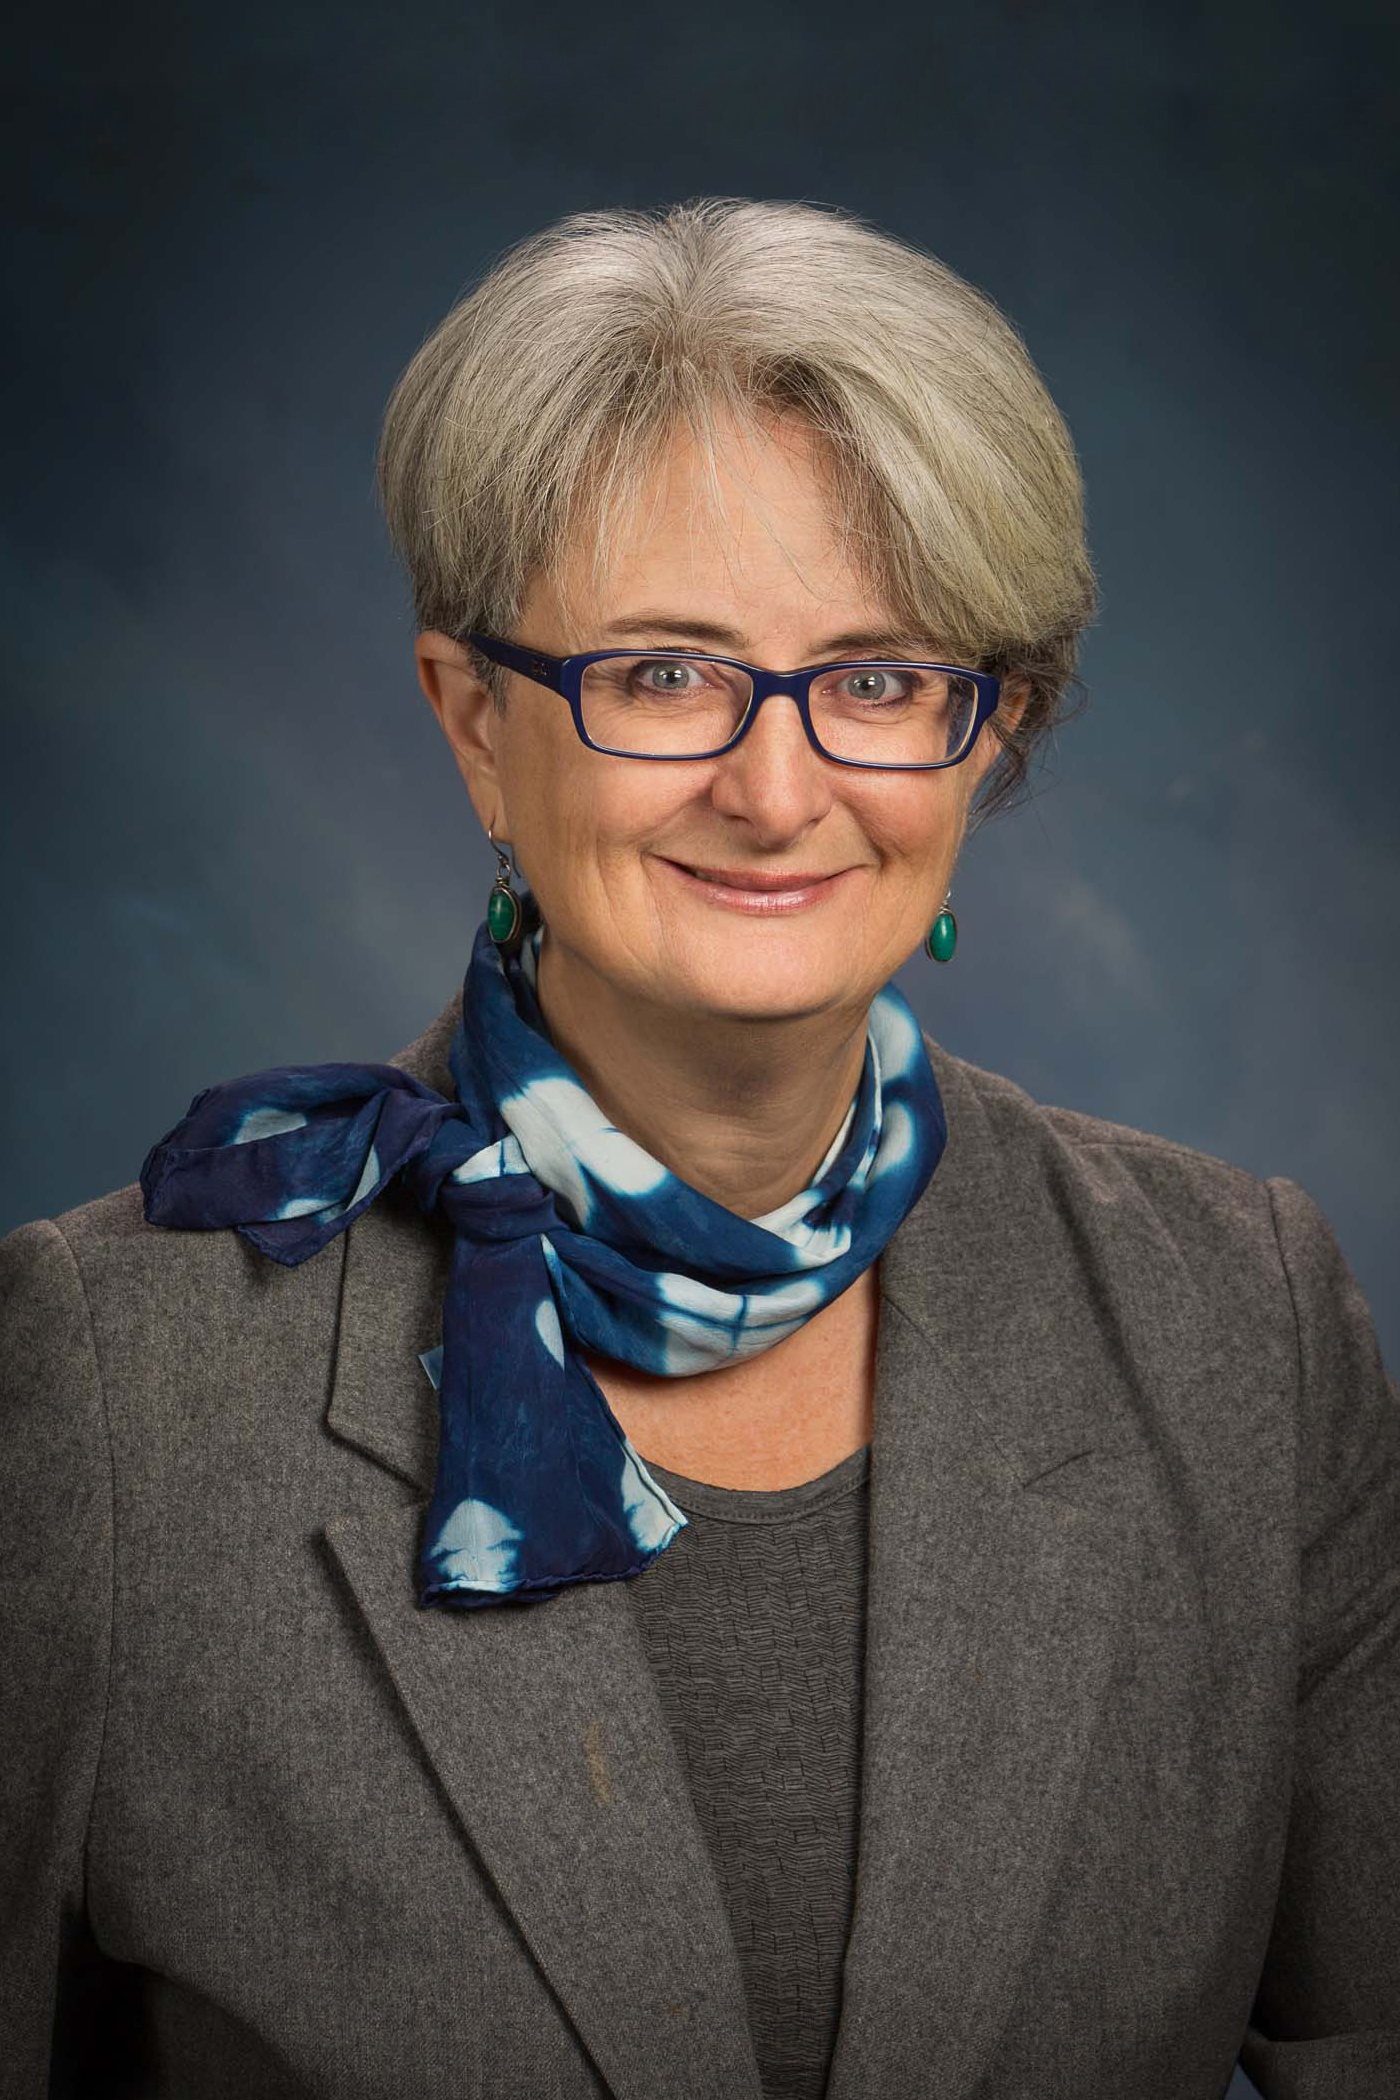 Portrait of Christine Manhart